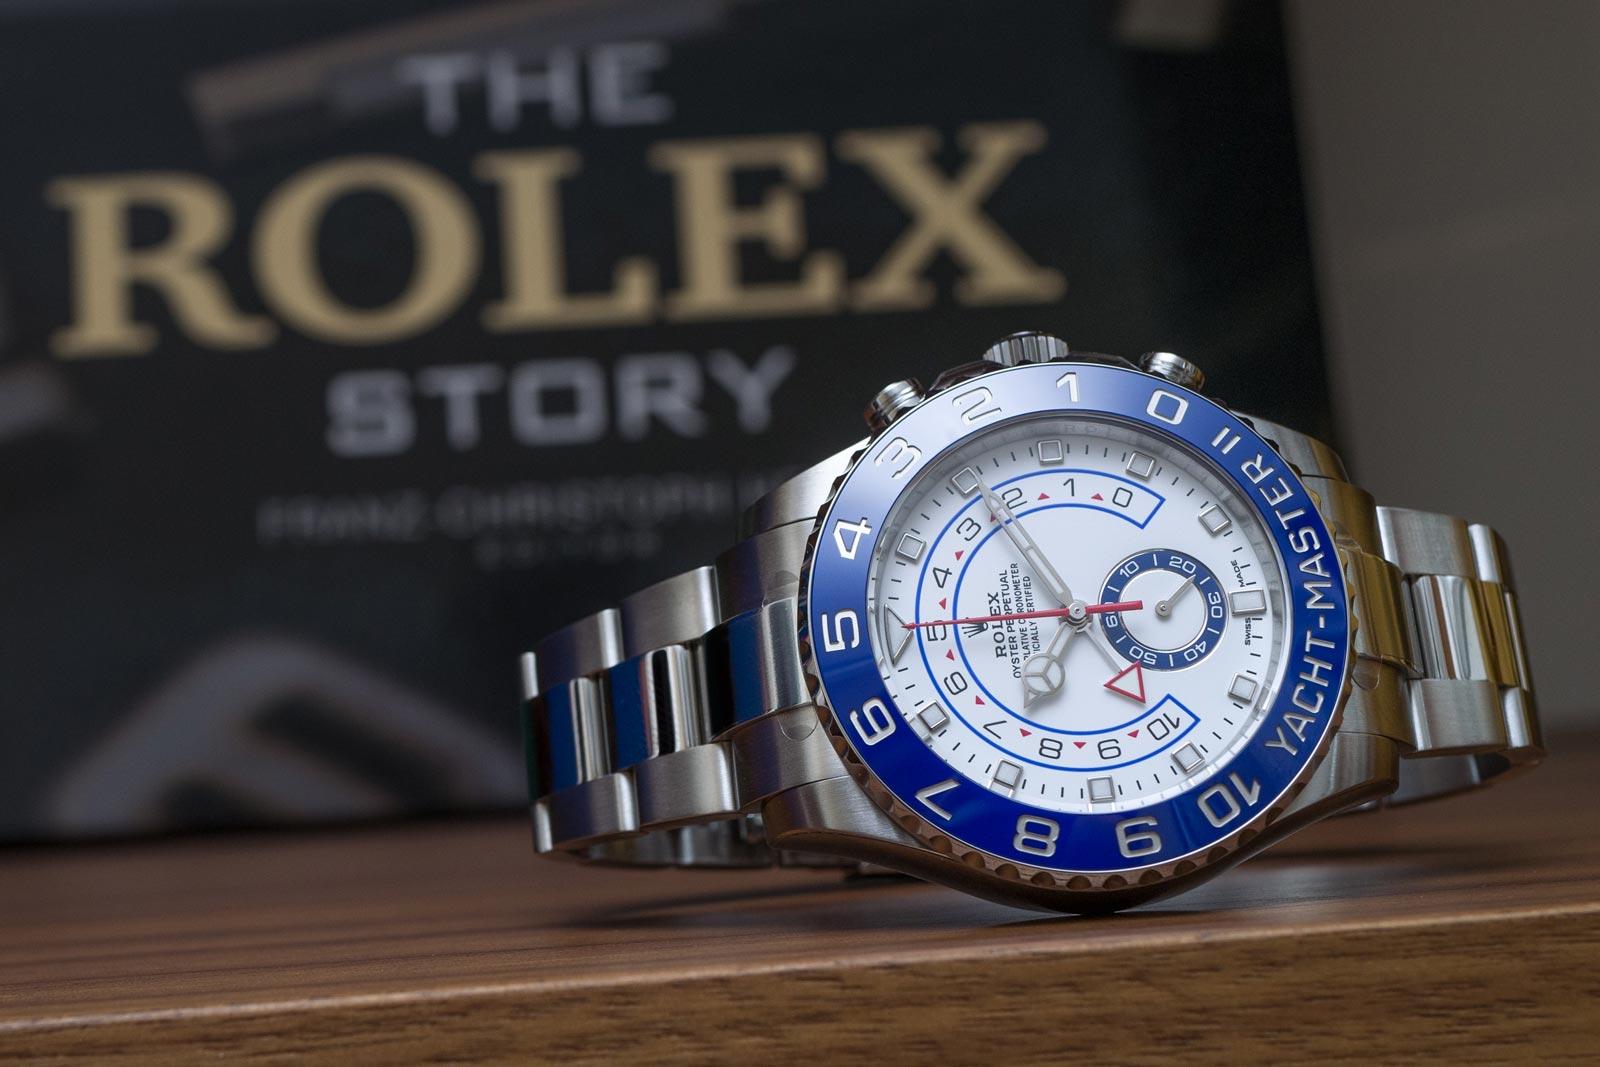 Rolex Yacht-Master II <br> Referenca 116680